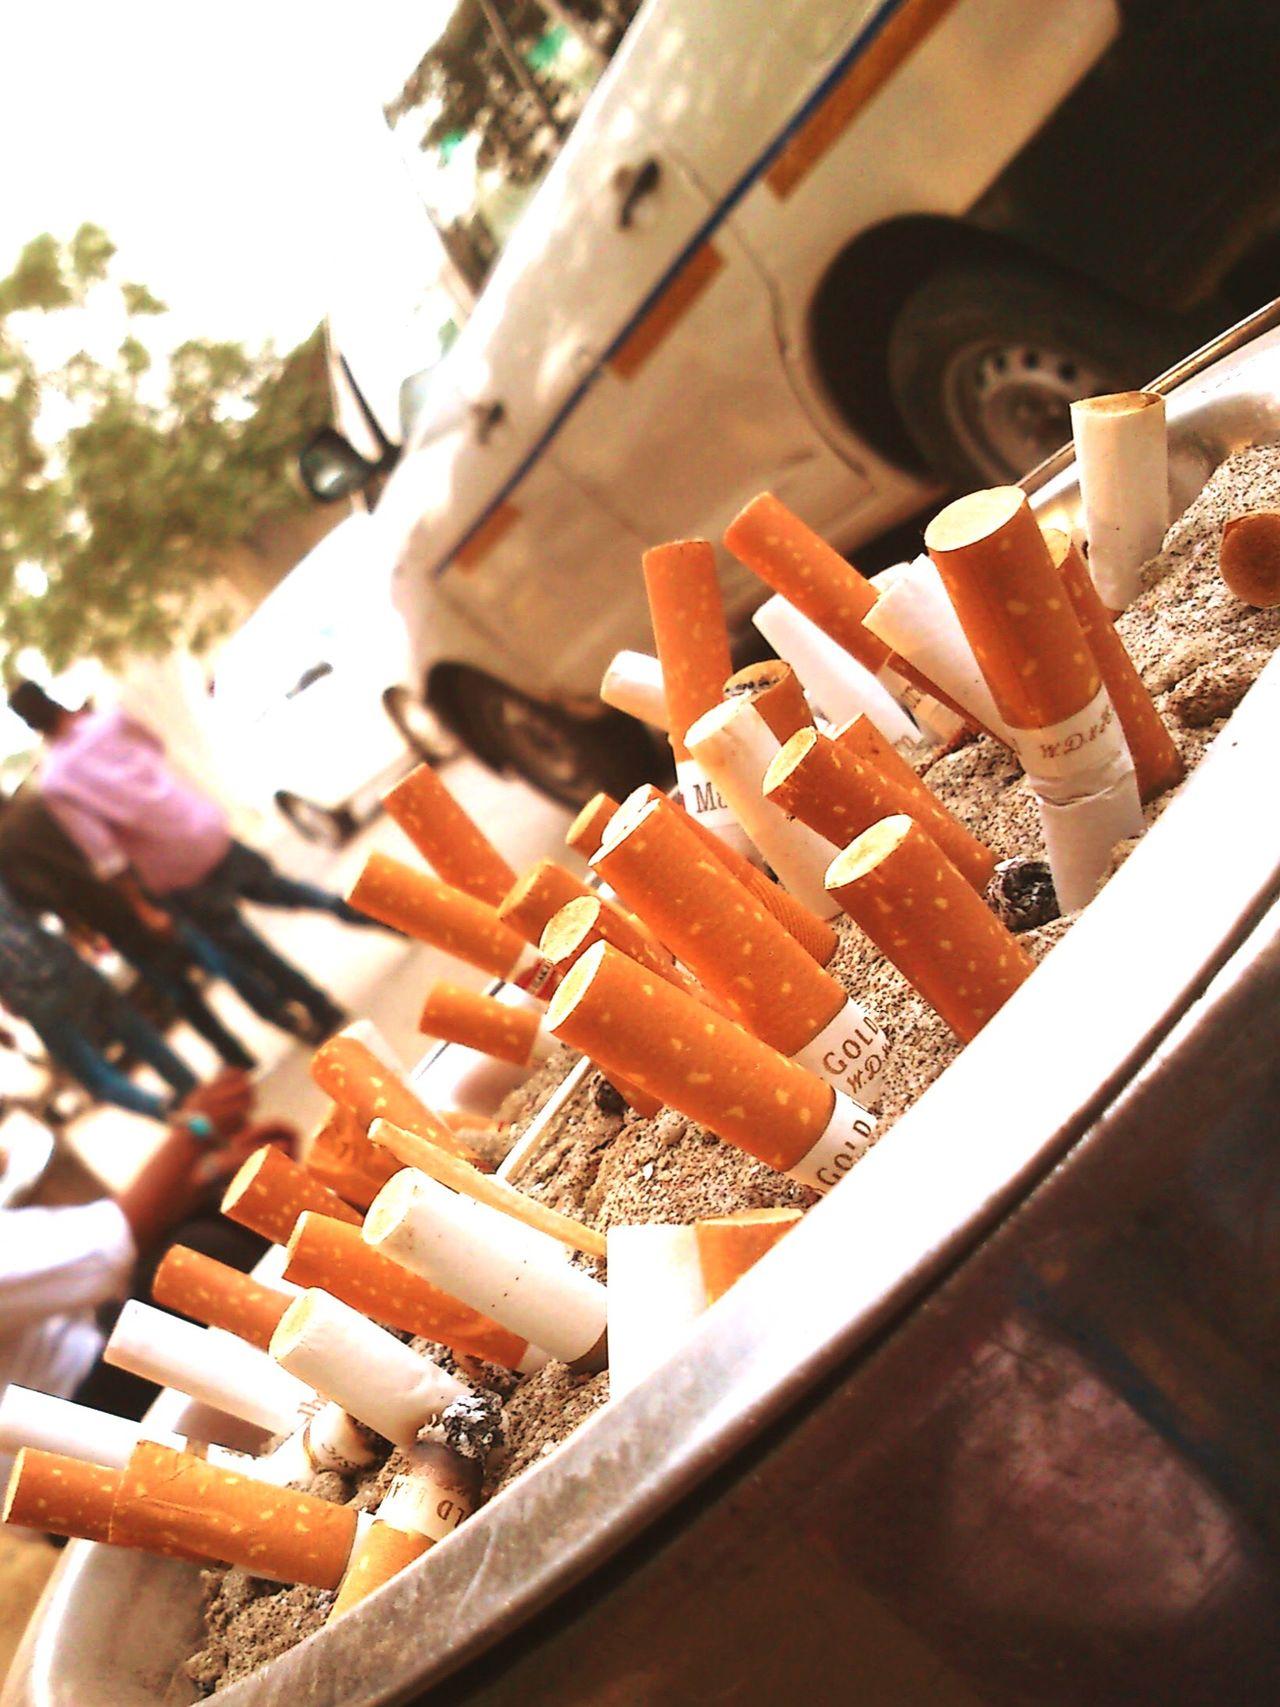 Burning Life's by Cigrettes Smoking